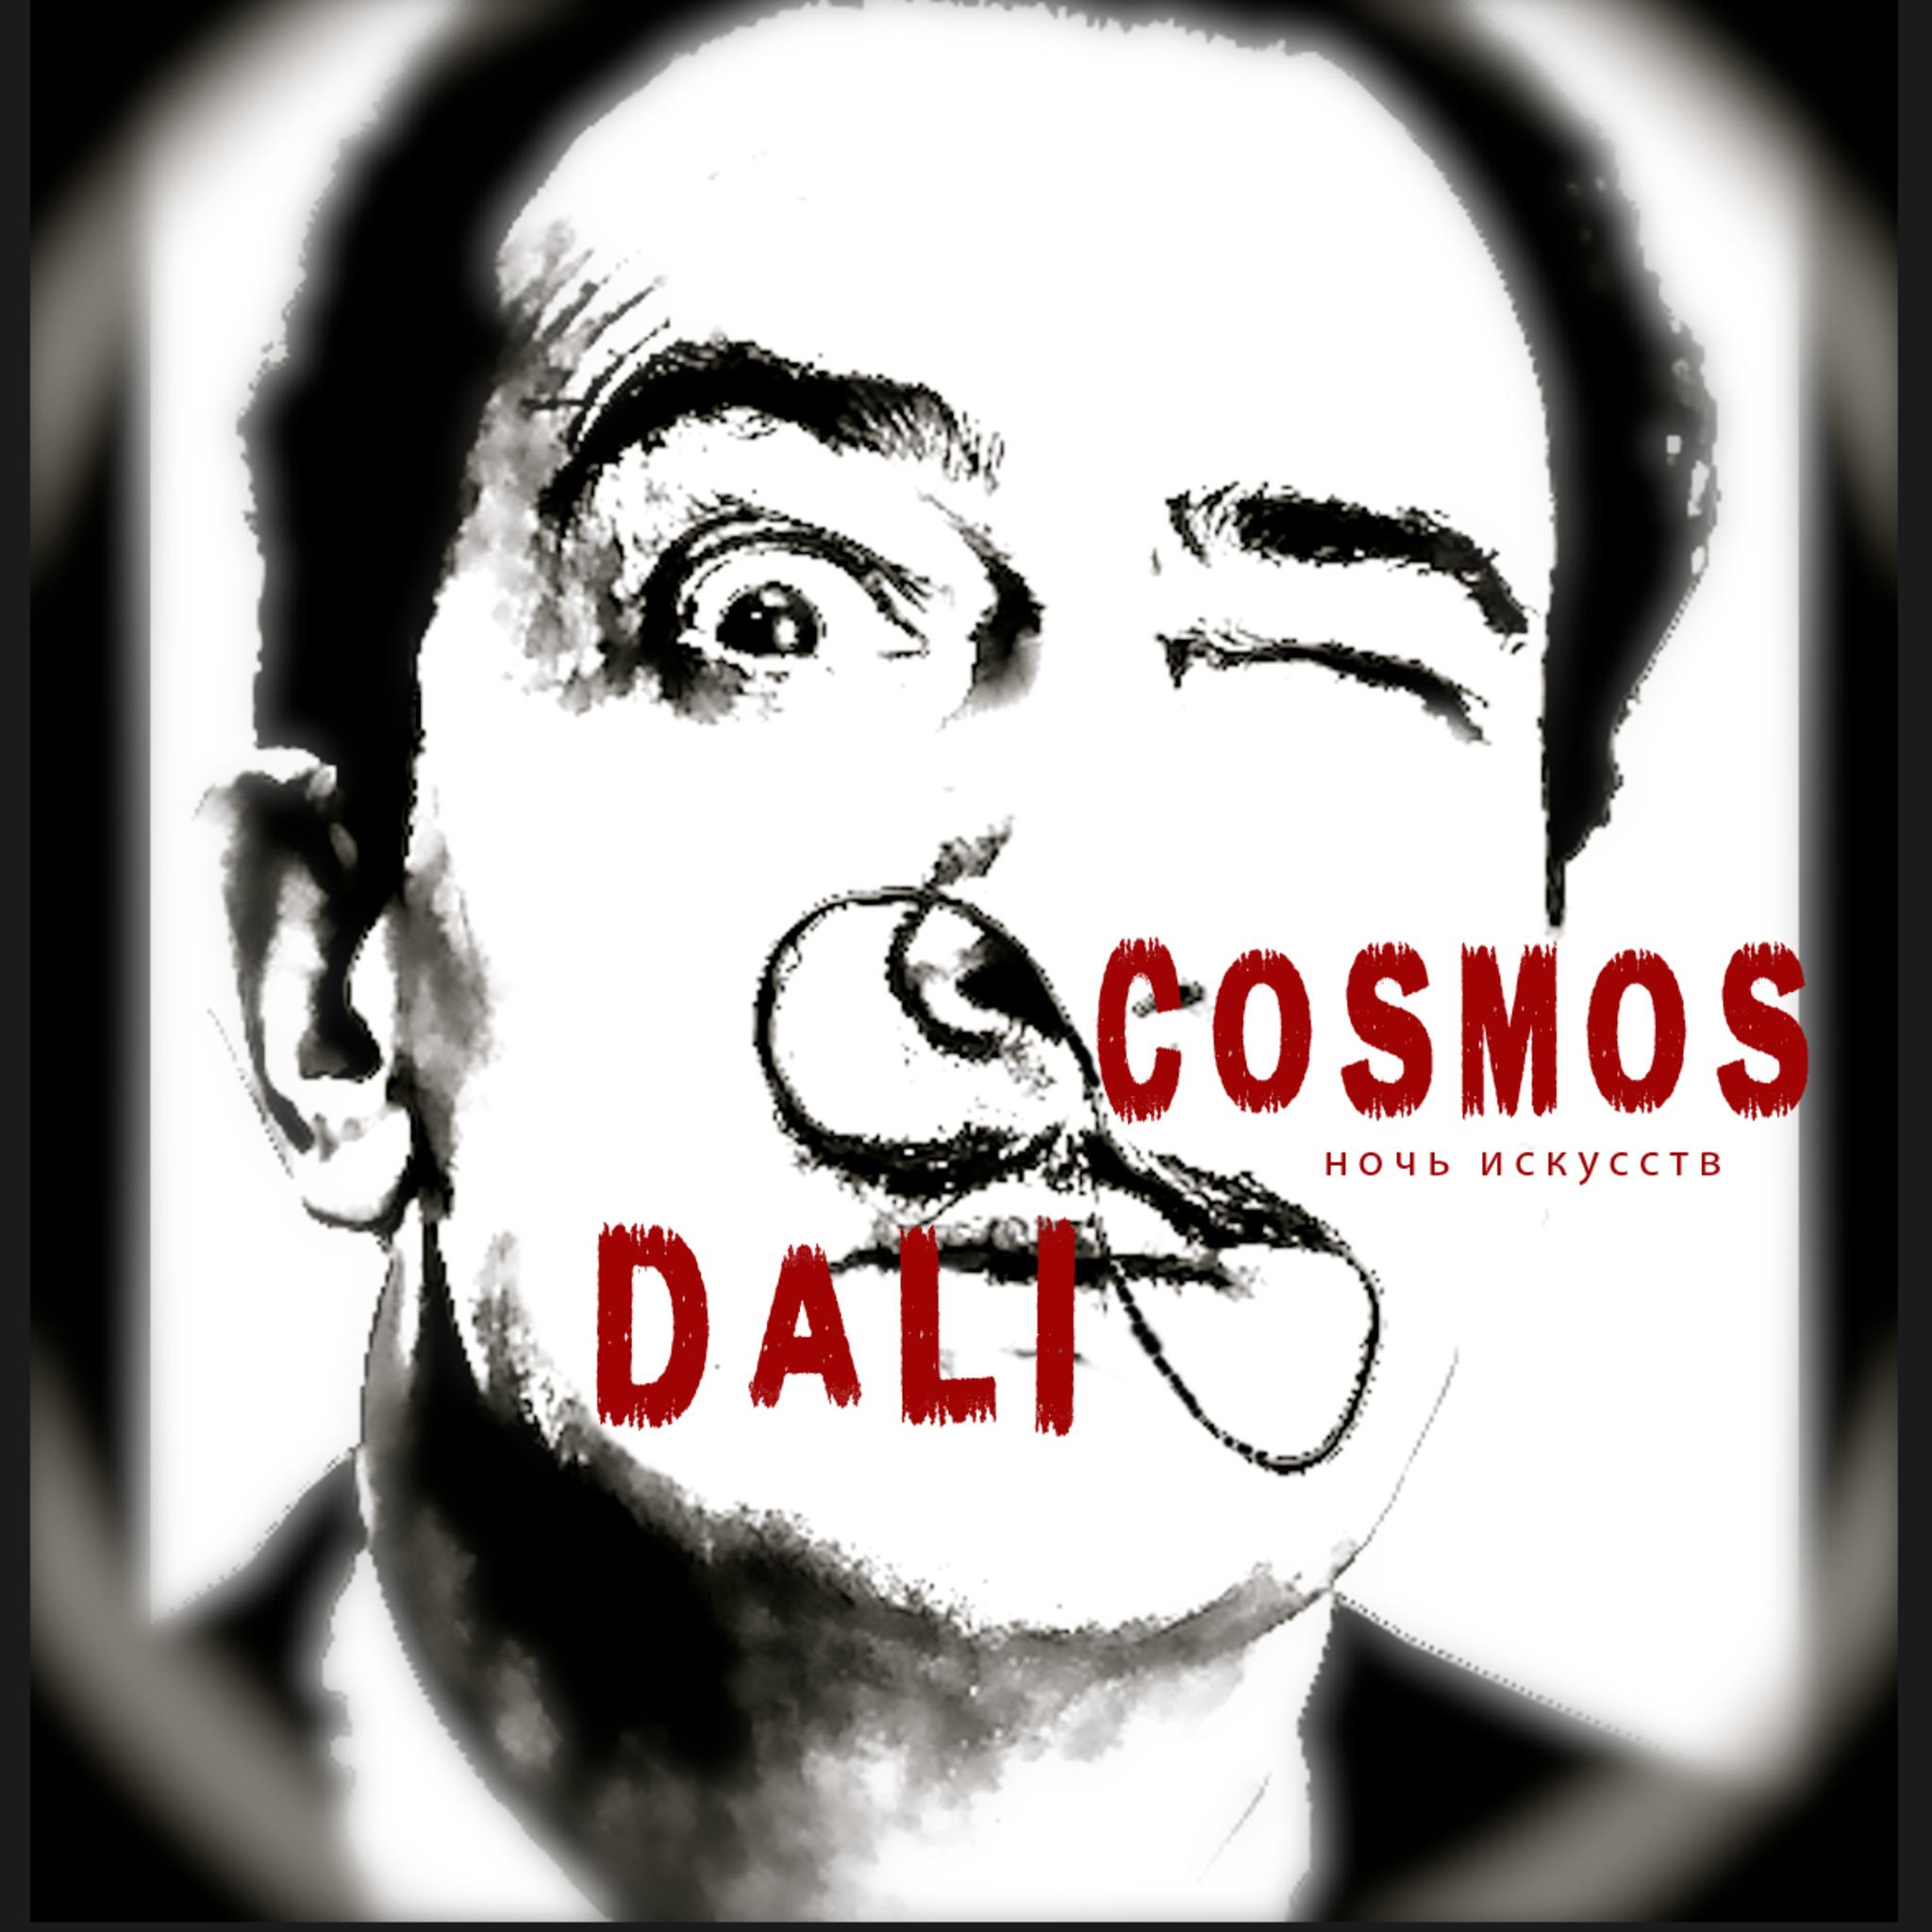 The program Cosmos Dali